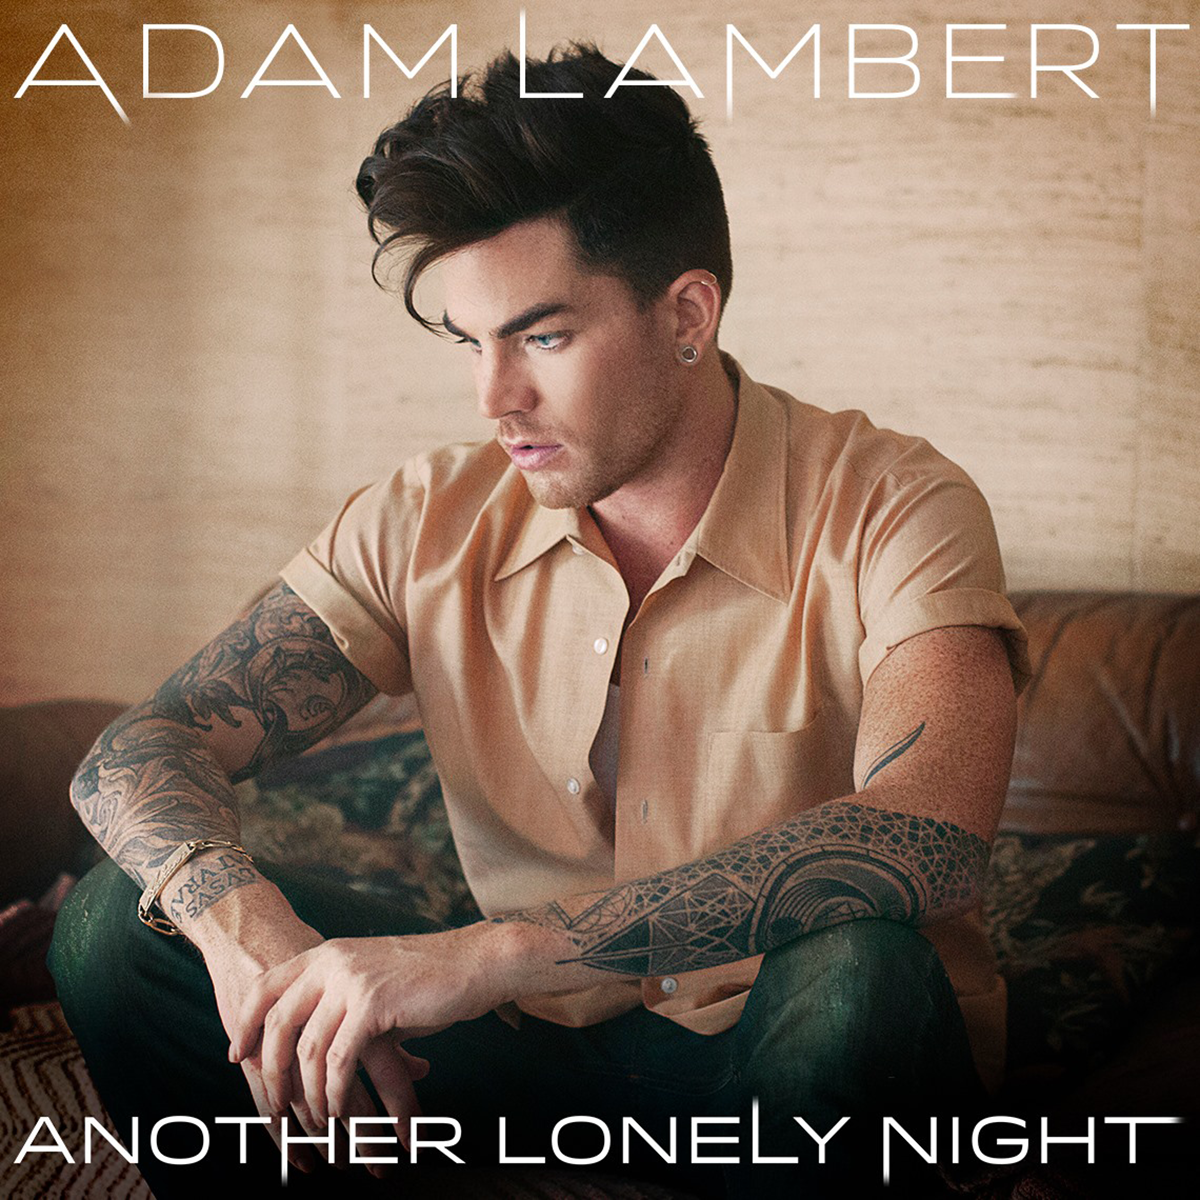 .@AdamLambert picks 'Another Lonely Night' as his next single. Listen: http://t.co/eEVdGkHIM7 http://t.co/56jQJ7vf5F